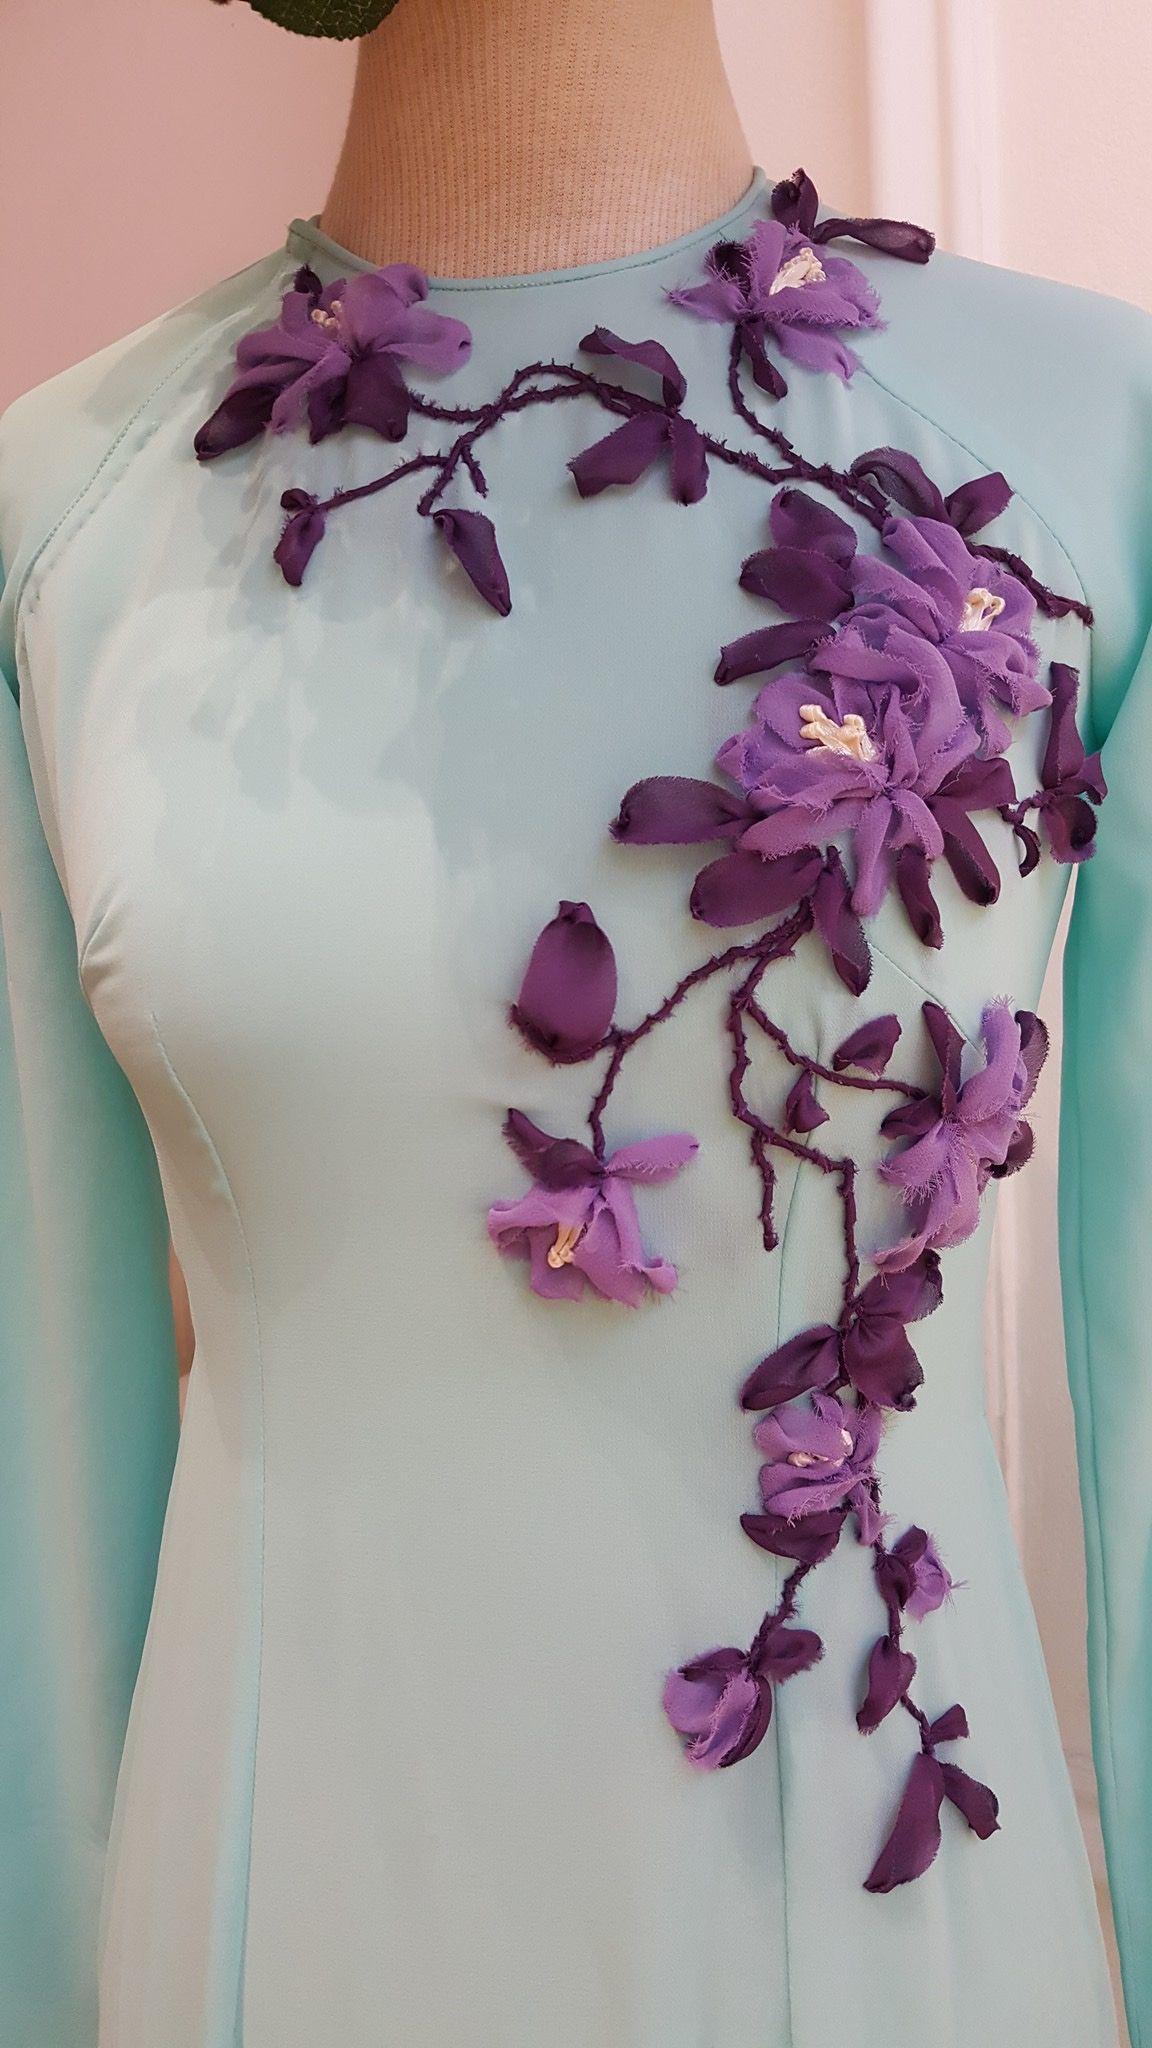 Pin by elena kovalenko on вышивка вышивка pinterest embroidery